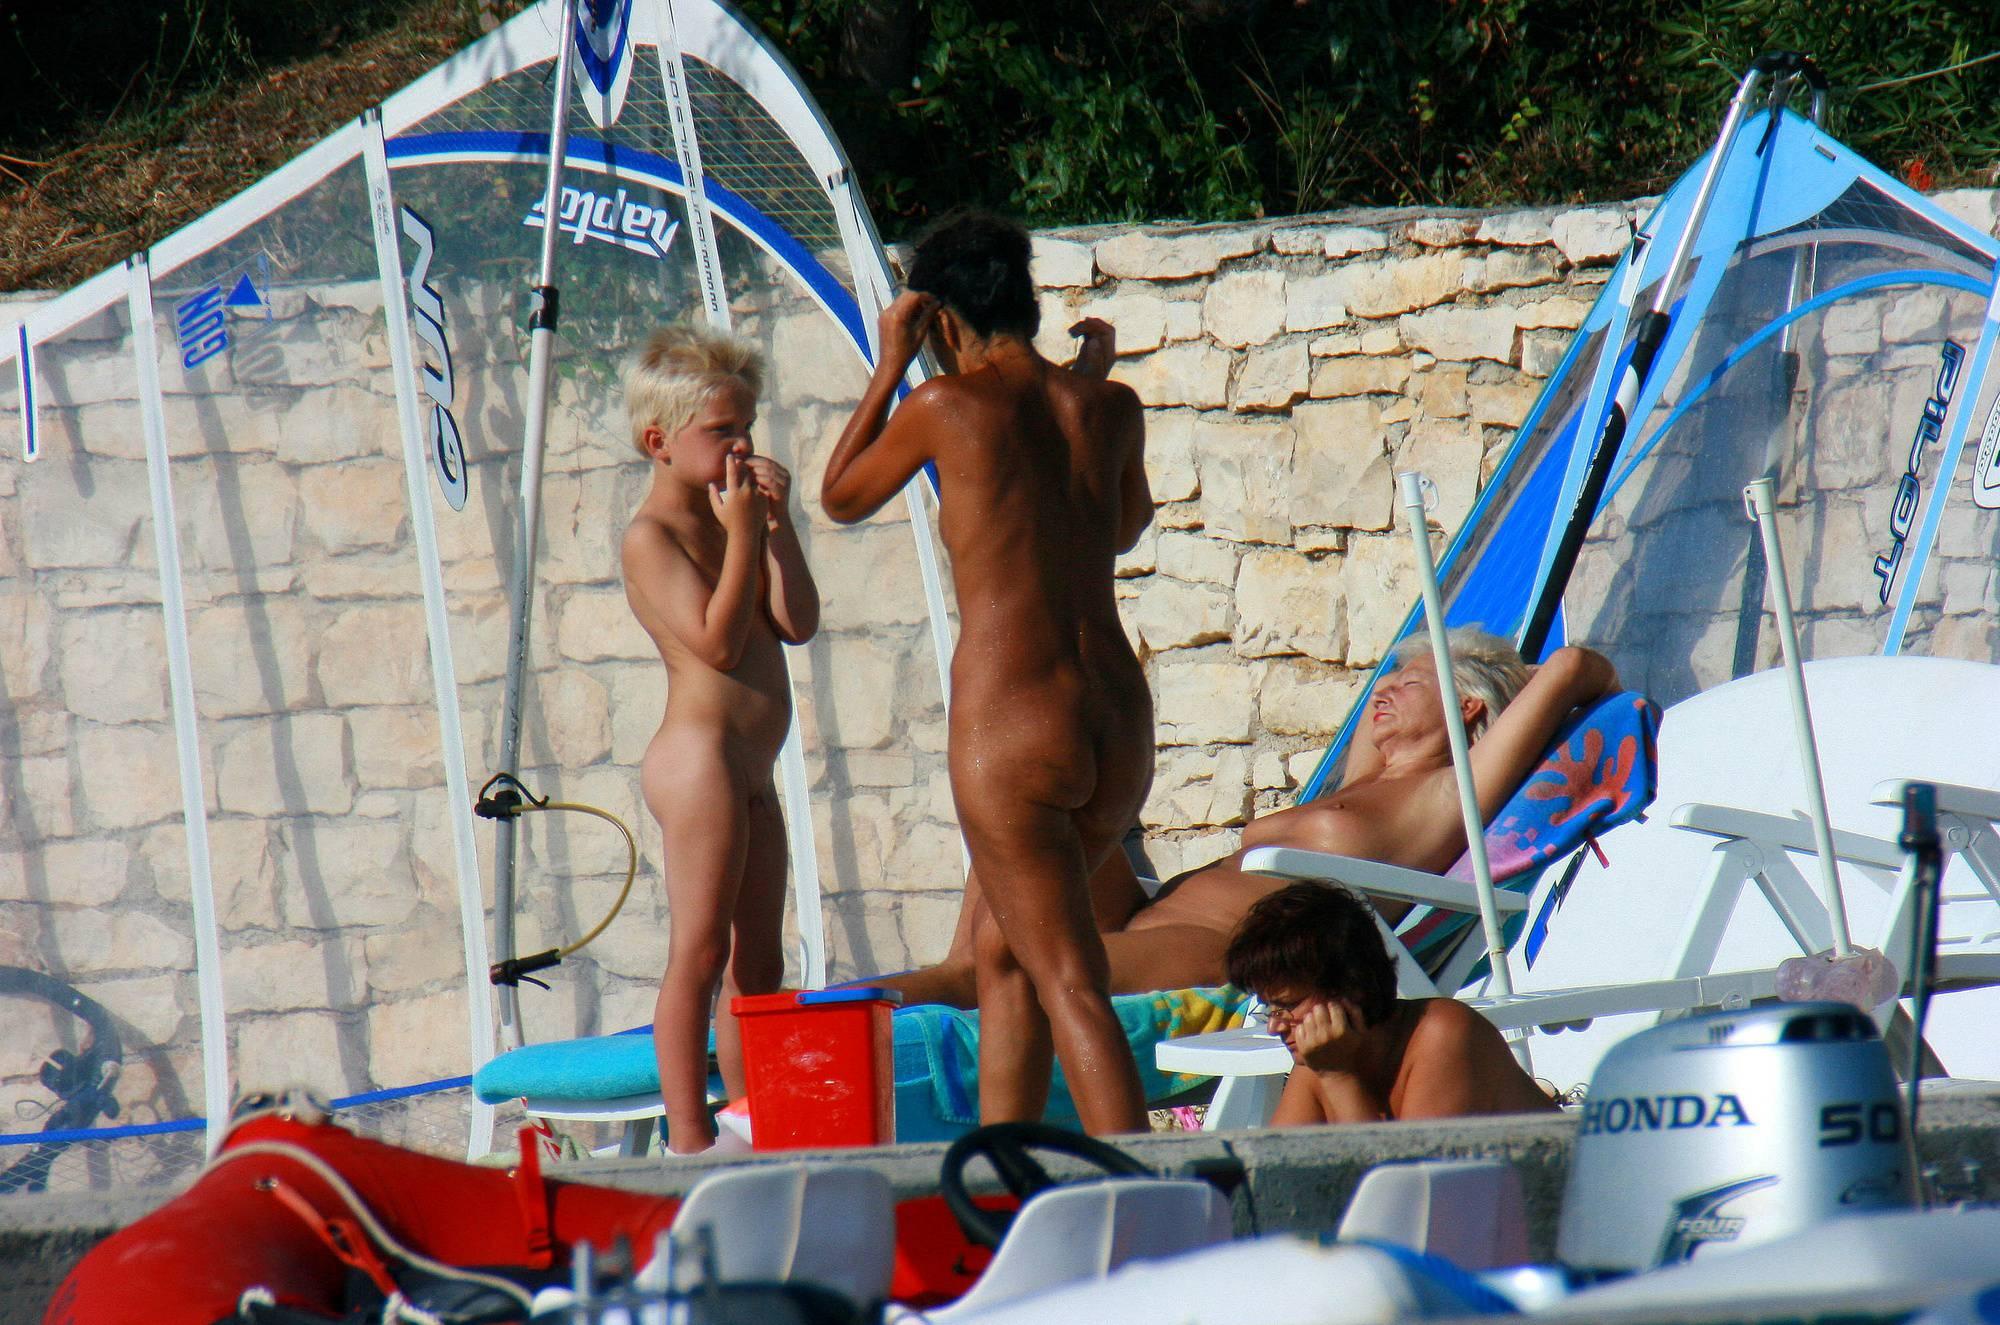 Nudist Pictures Ula FKK Shore Family Site - 1